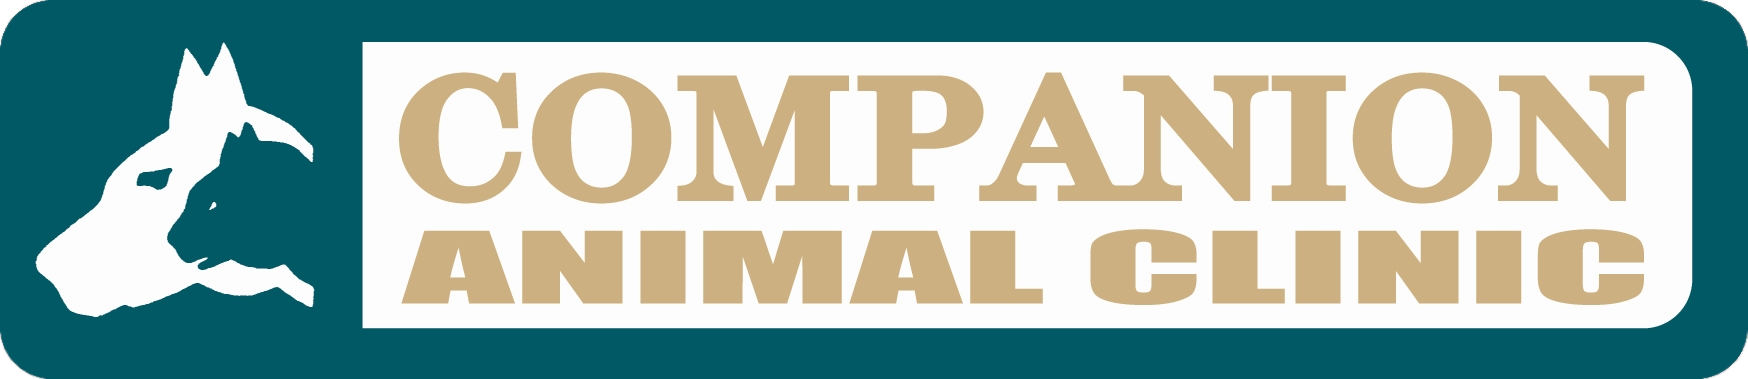 Companion Animal Clinic Logo